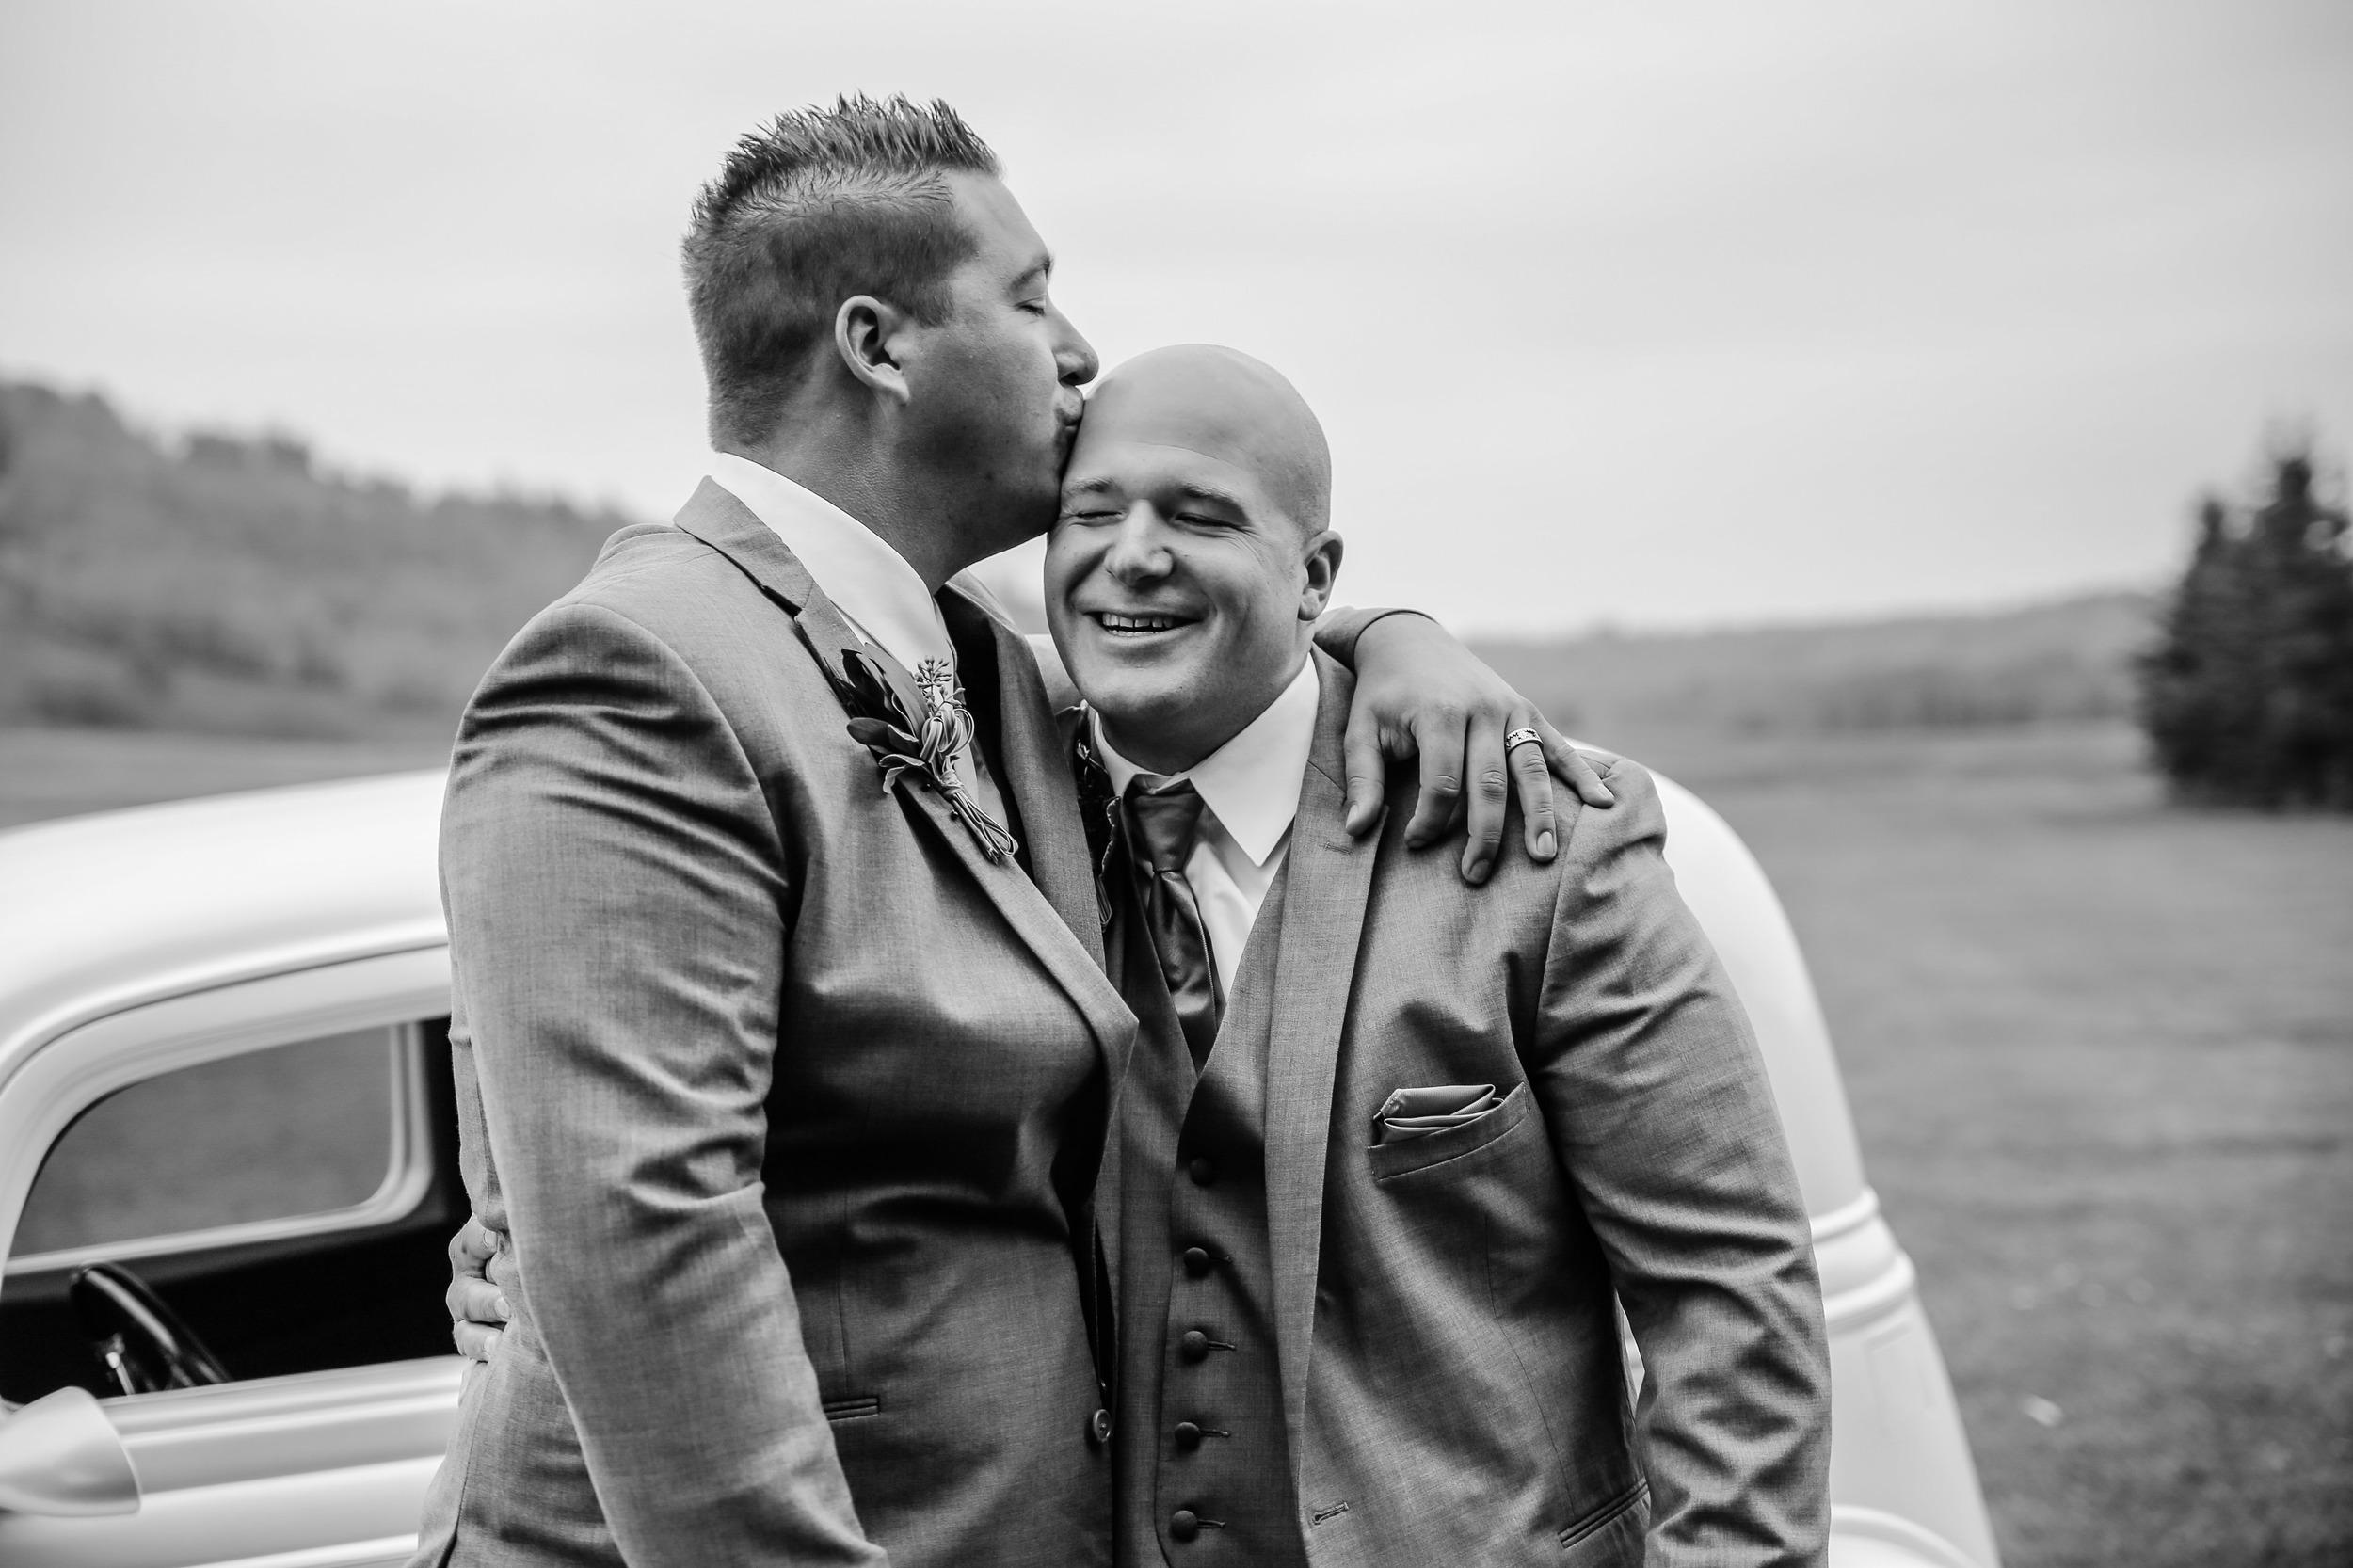 Groomsman Love - Photography by Benamoz 2015 Wedding Contest.jpg